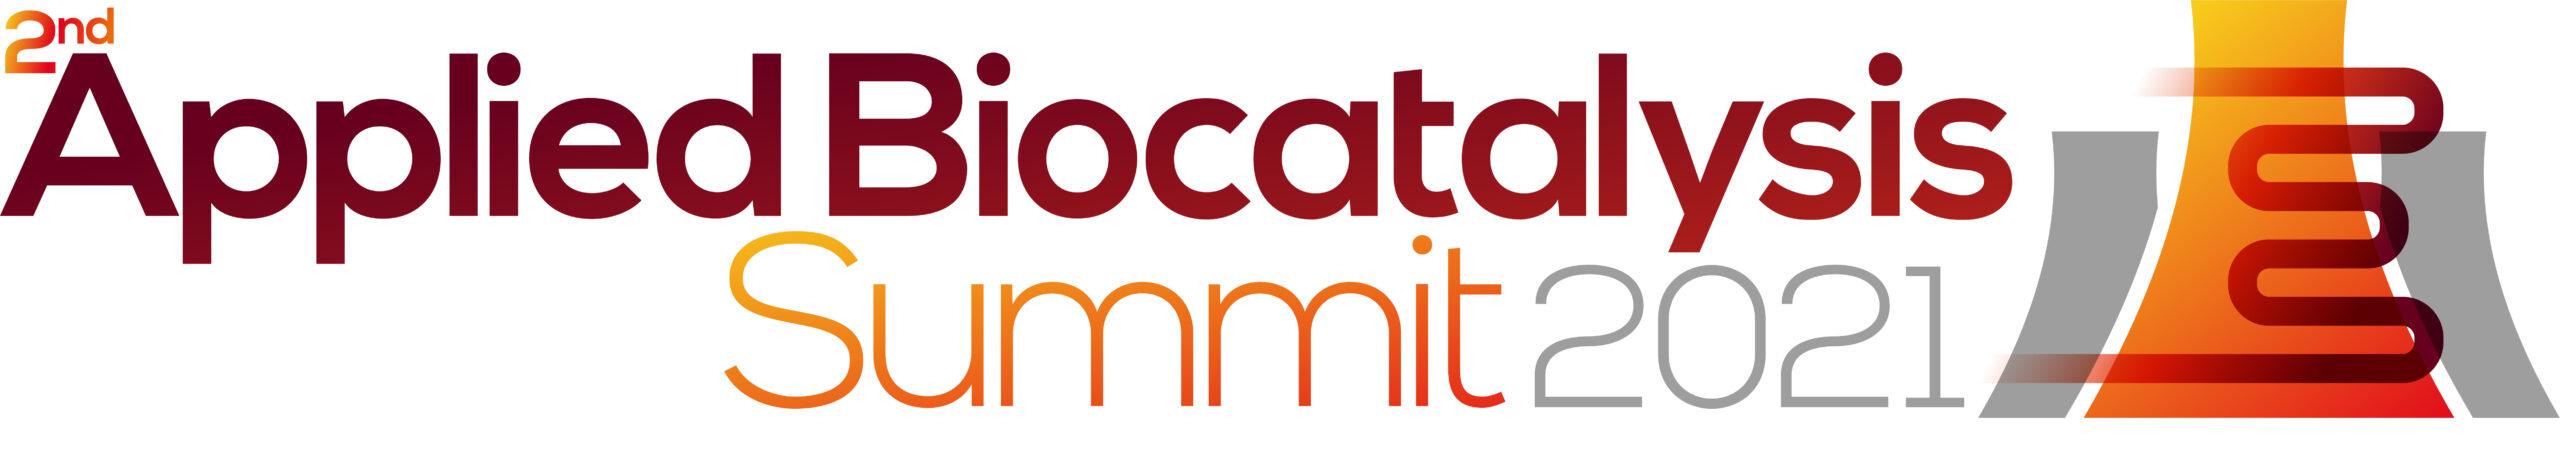 HW210621 2nd Applied Biocatalysis Summit 2021 logo